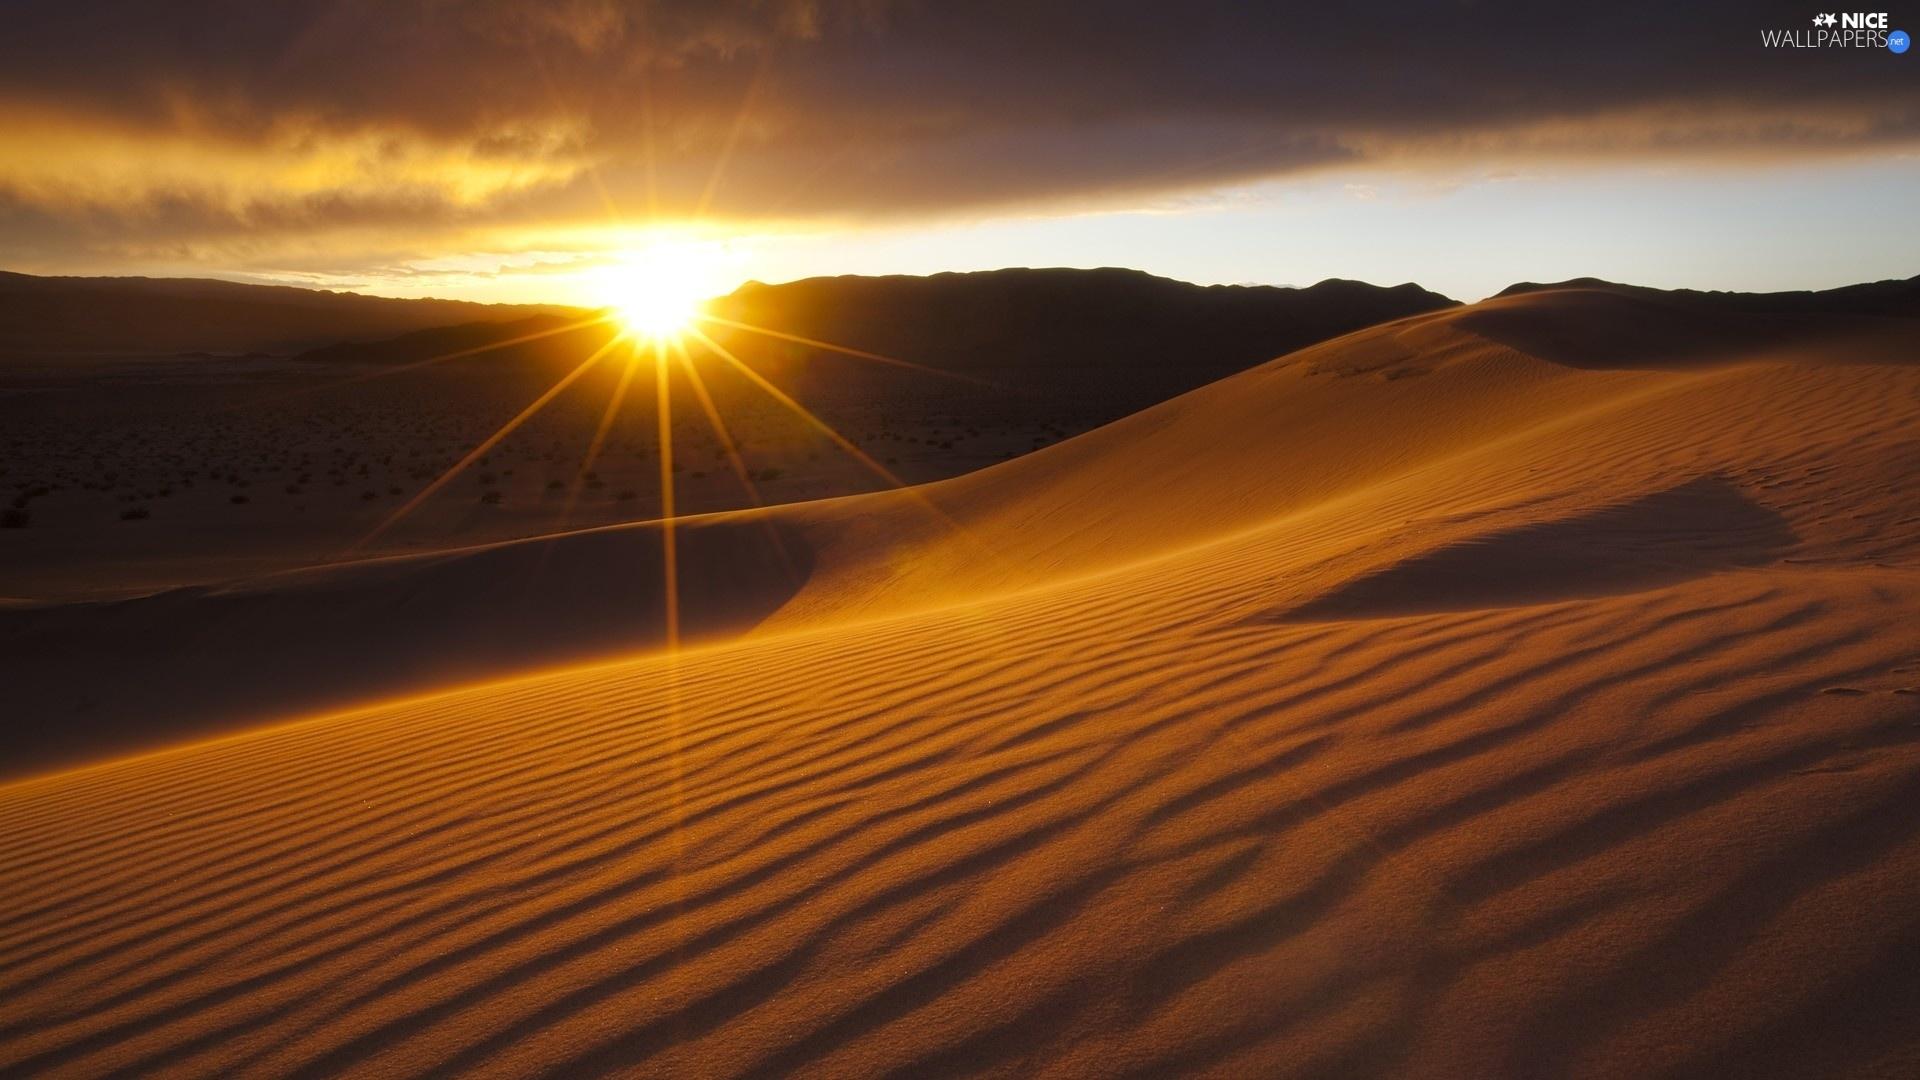 desert, Sun, Sunset Wallpapers HD / Desktop and Mobile